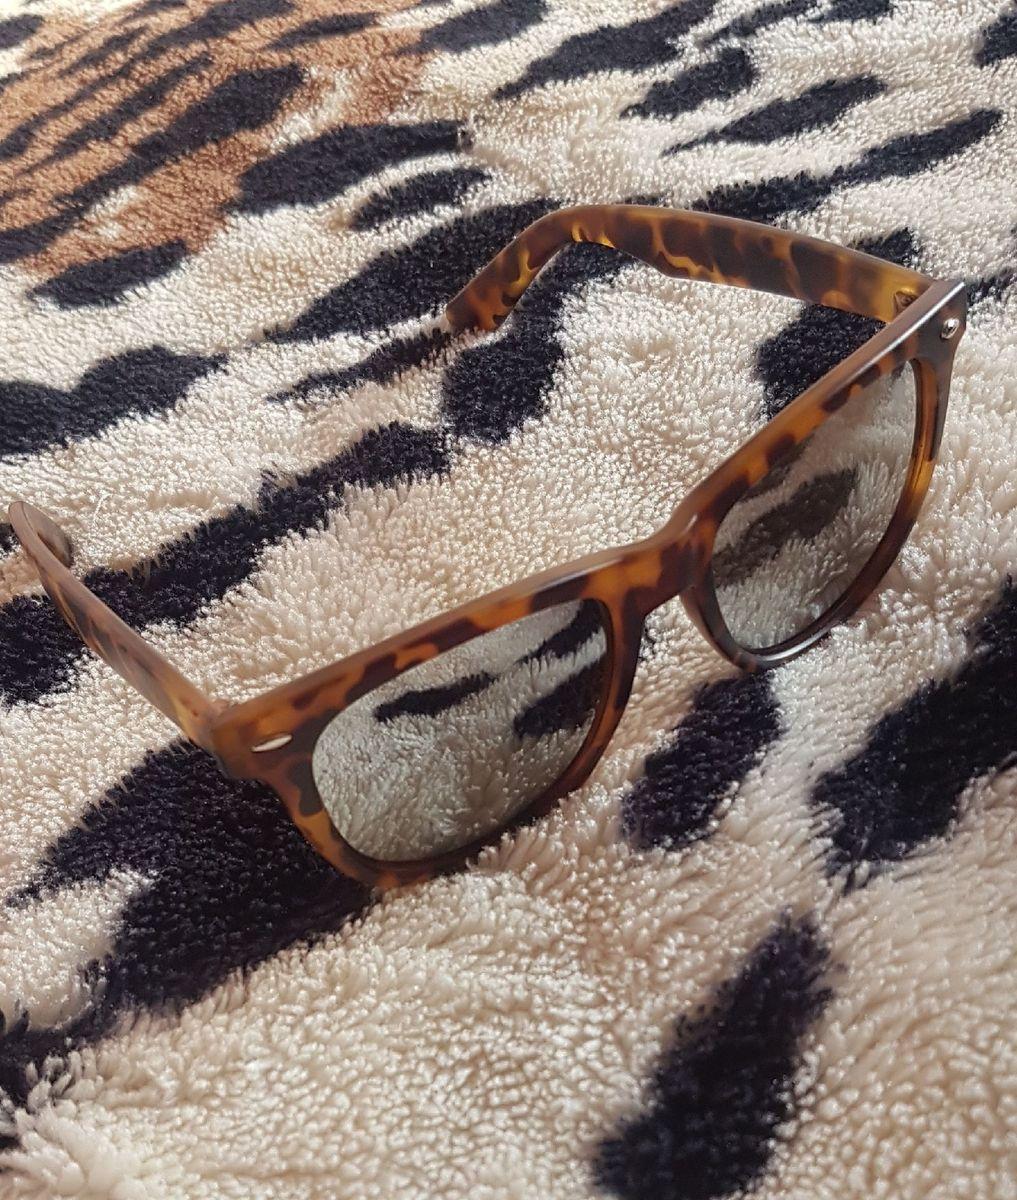 óculos polo wear - óculos polo-wear.  Czm6ly9wag90b3muzw5qb2vplmnvbs5ici9wcm9kdwn0cy83ntyymzyvzdqxy2u0mji3mjm0nmywzji3nda2mjnin2vlnwyzotguanbn  ... a4cd592473